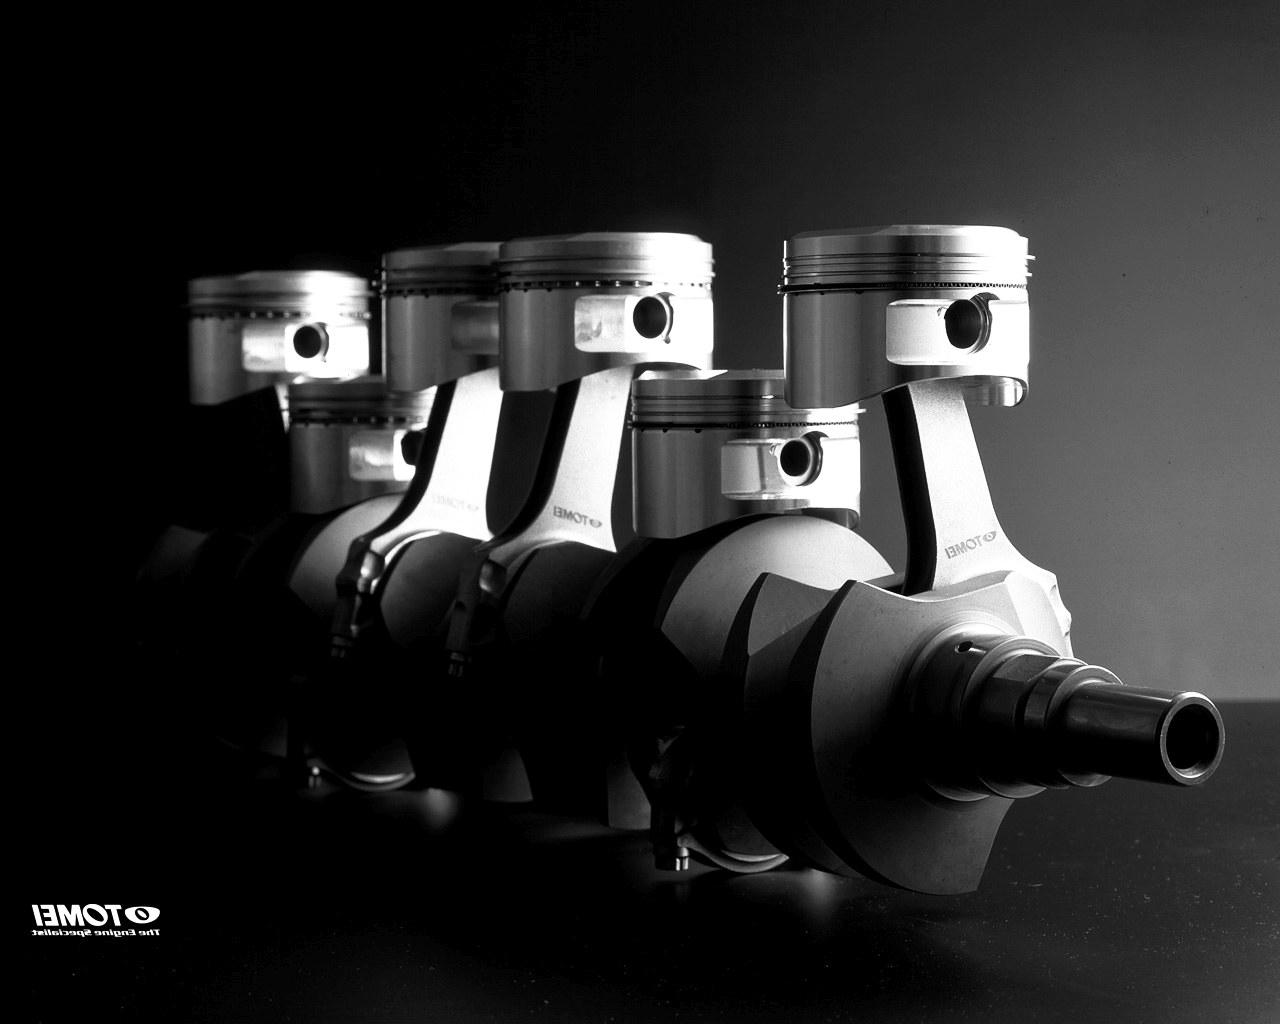 Engine Piston Wallpaper